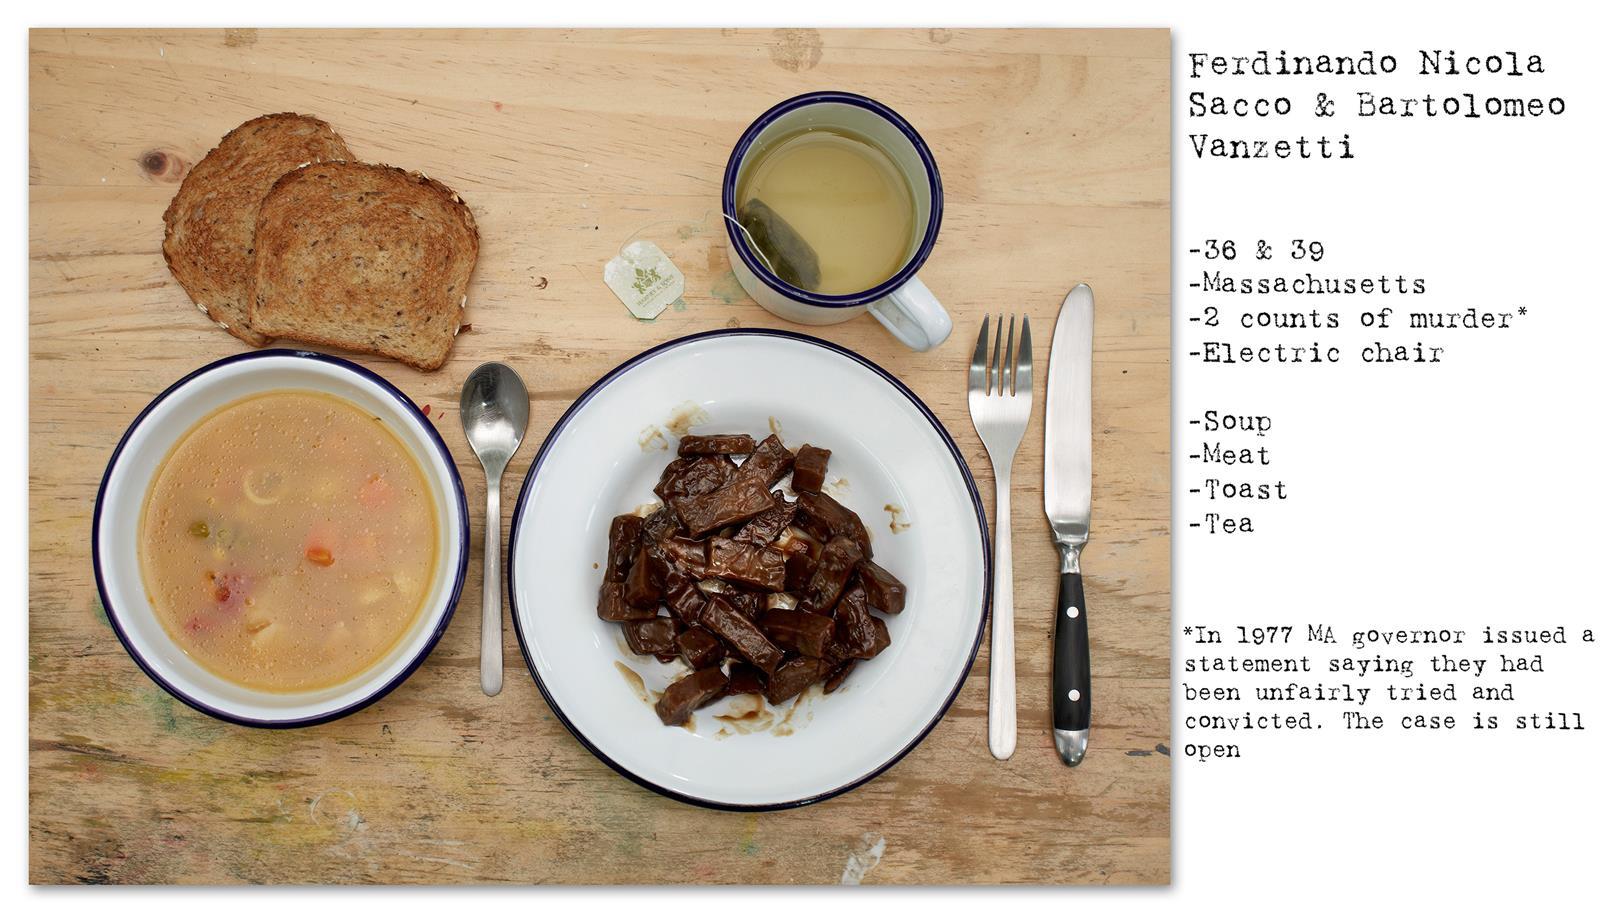 Death Row Prisoner's Last Meal (1)